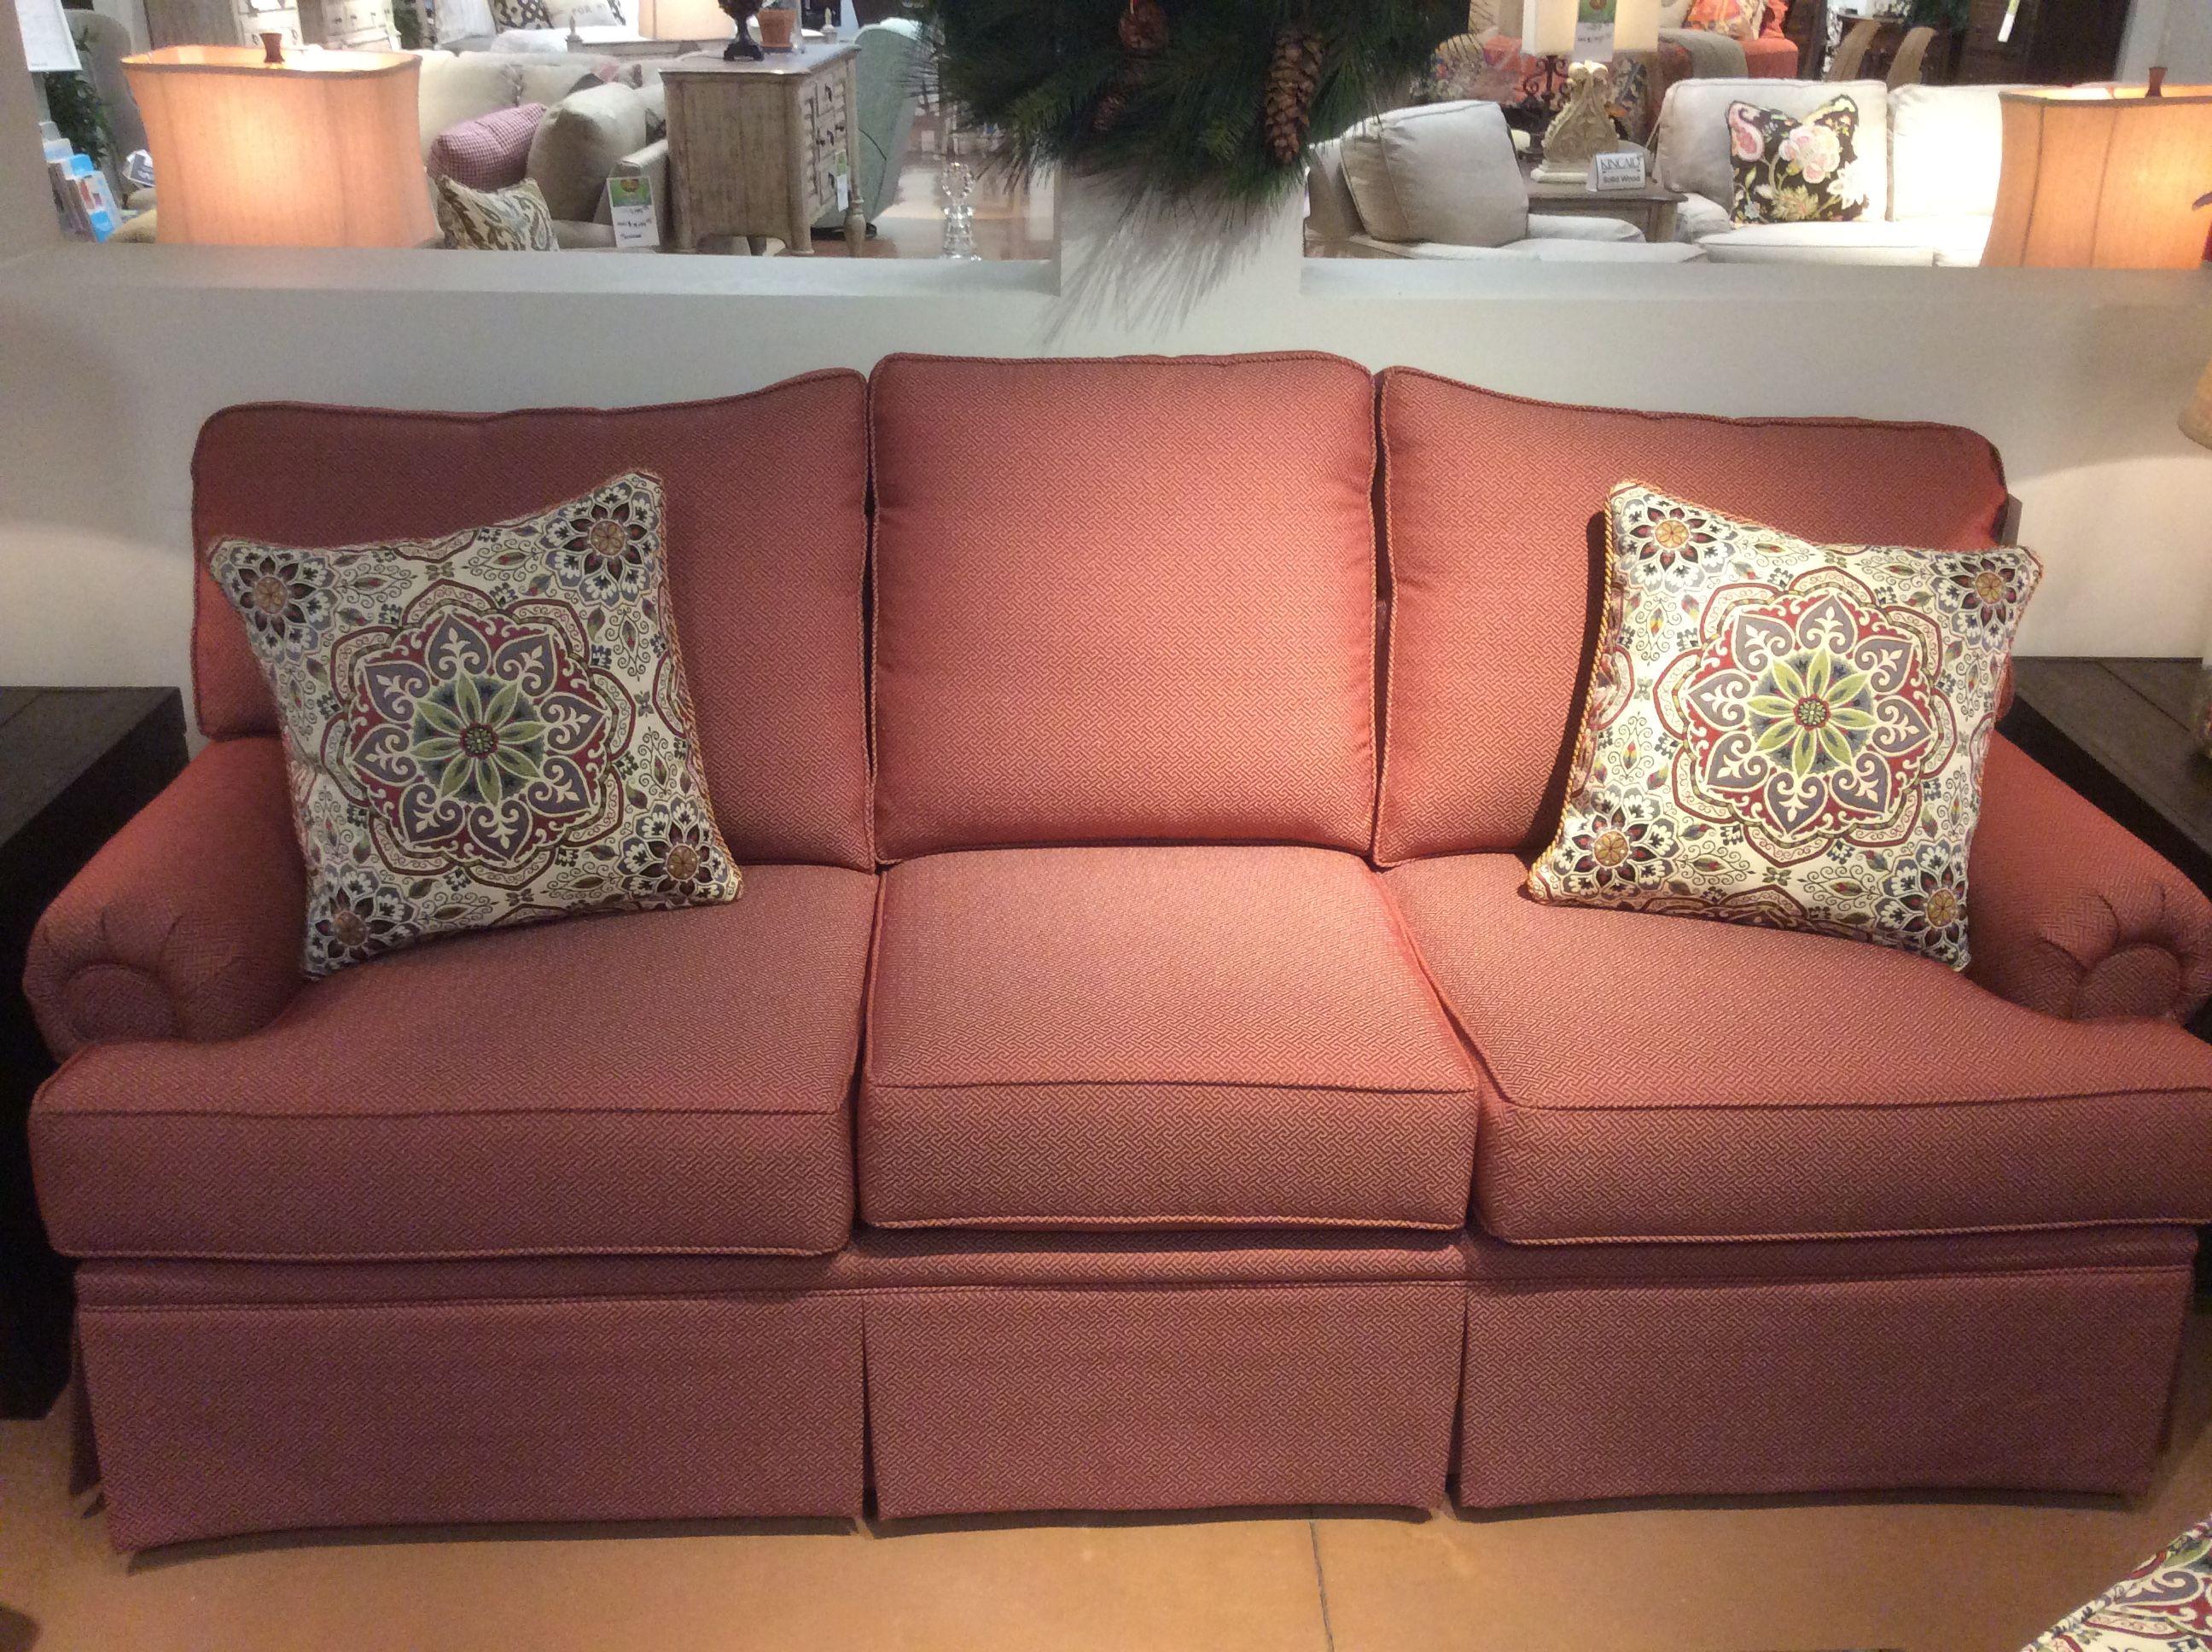 Sensational Masterfield Sofa Available At Turners Fine Furniture Visit Creativecarmelina Interior Chair Design Creativecarmelinacom